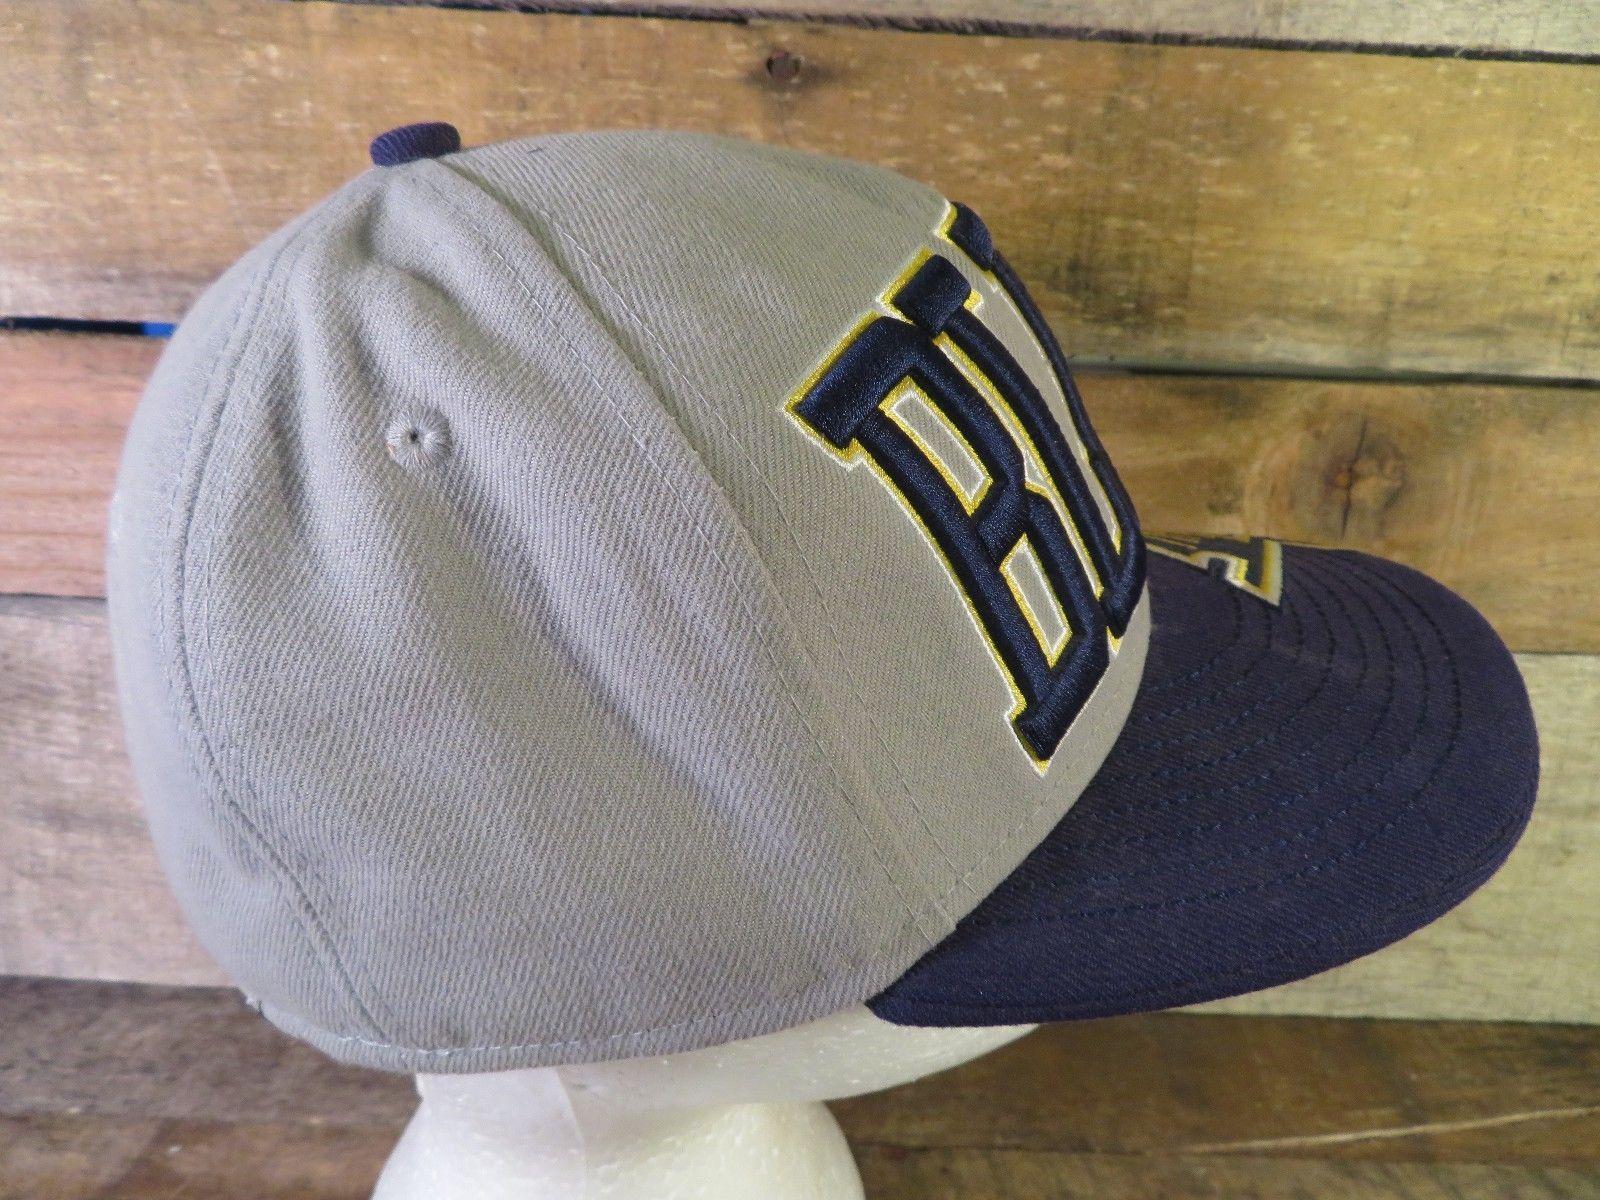 c075d0d041a ... closeout st louis blues hockey nhl new era size 7 fitted hat adult cap  4e629 3dedd